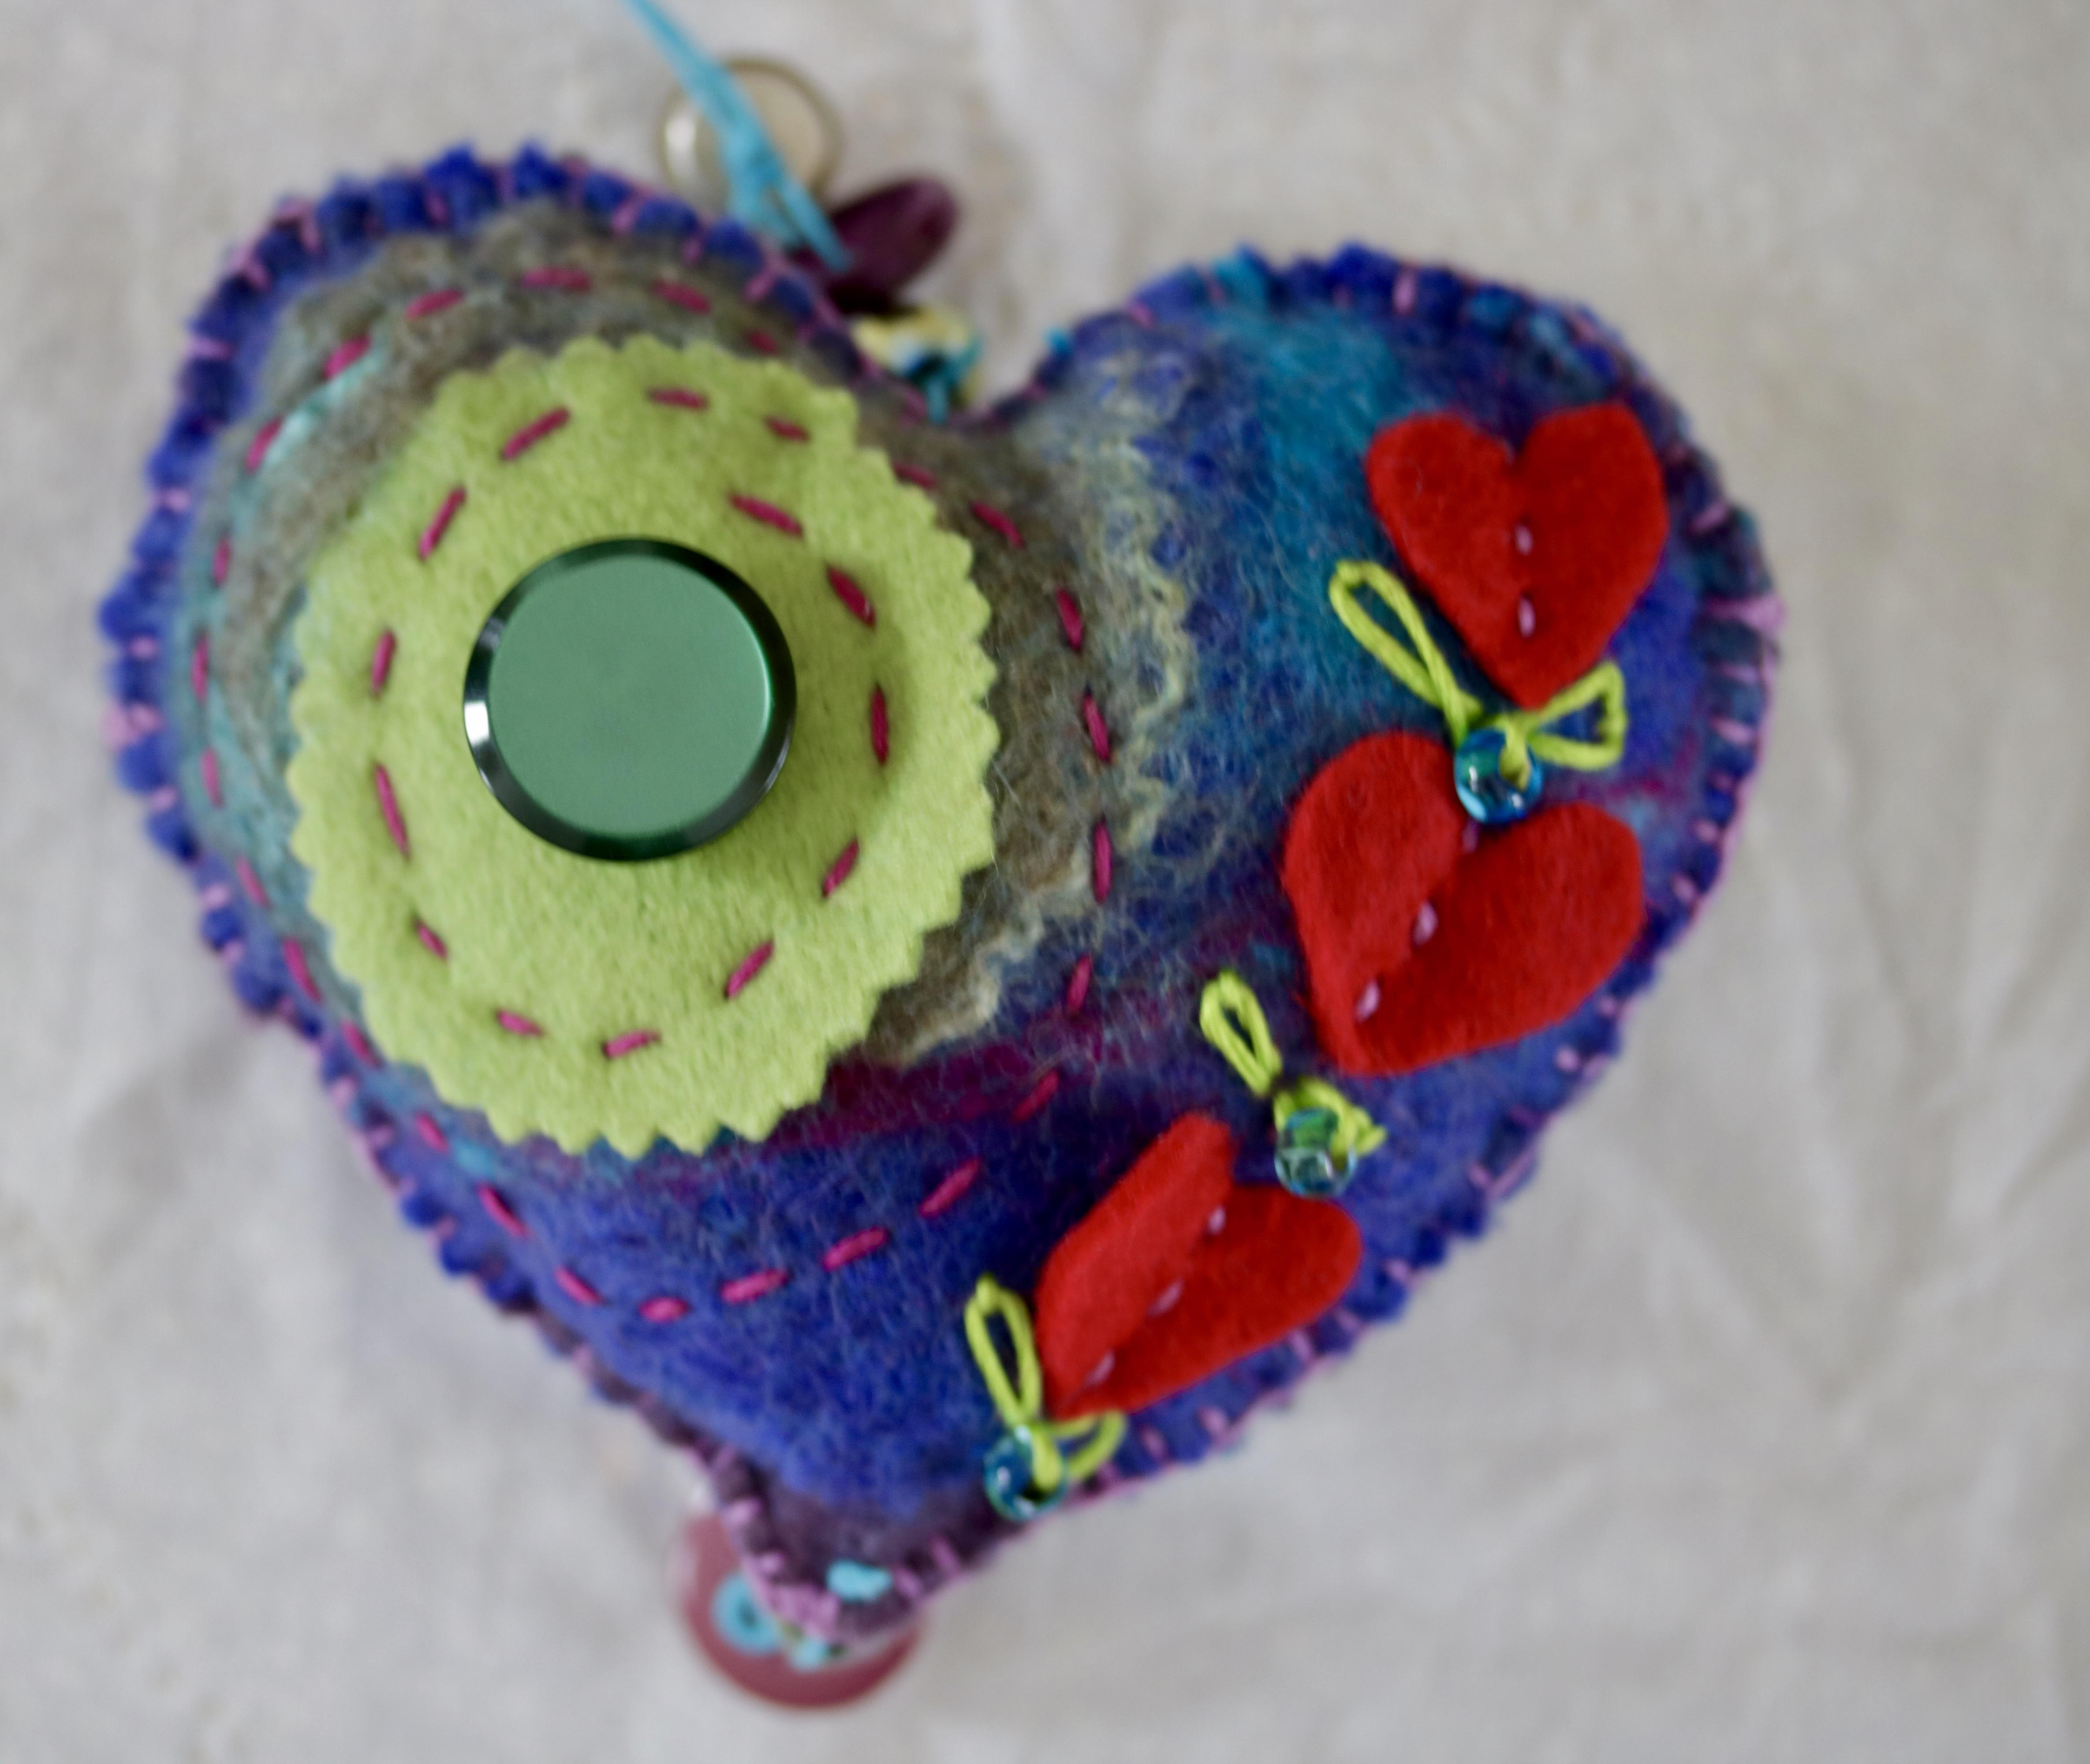 heart made from felt